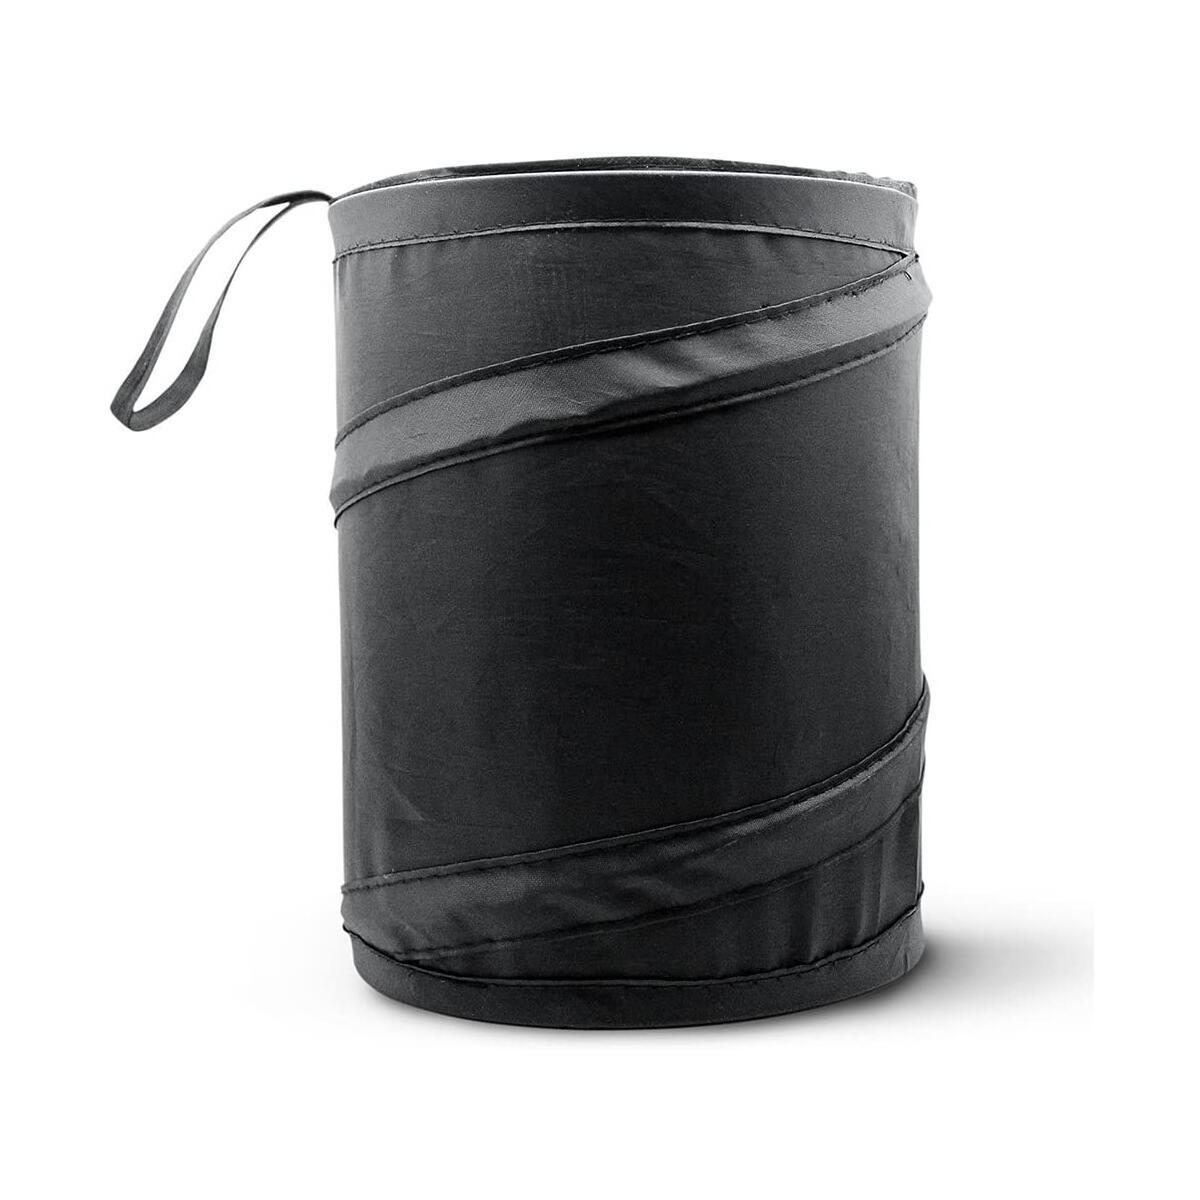 Car Trash Can, Portable Garbage Bin, Collapsible Pop-up Water Proof Bag, Waste Basket Bin, Rubbish Bin